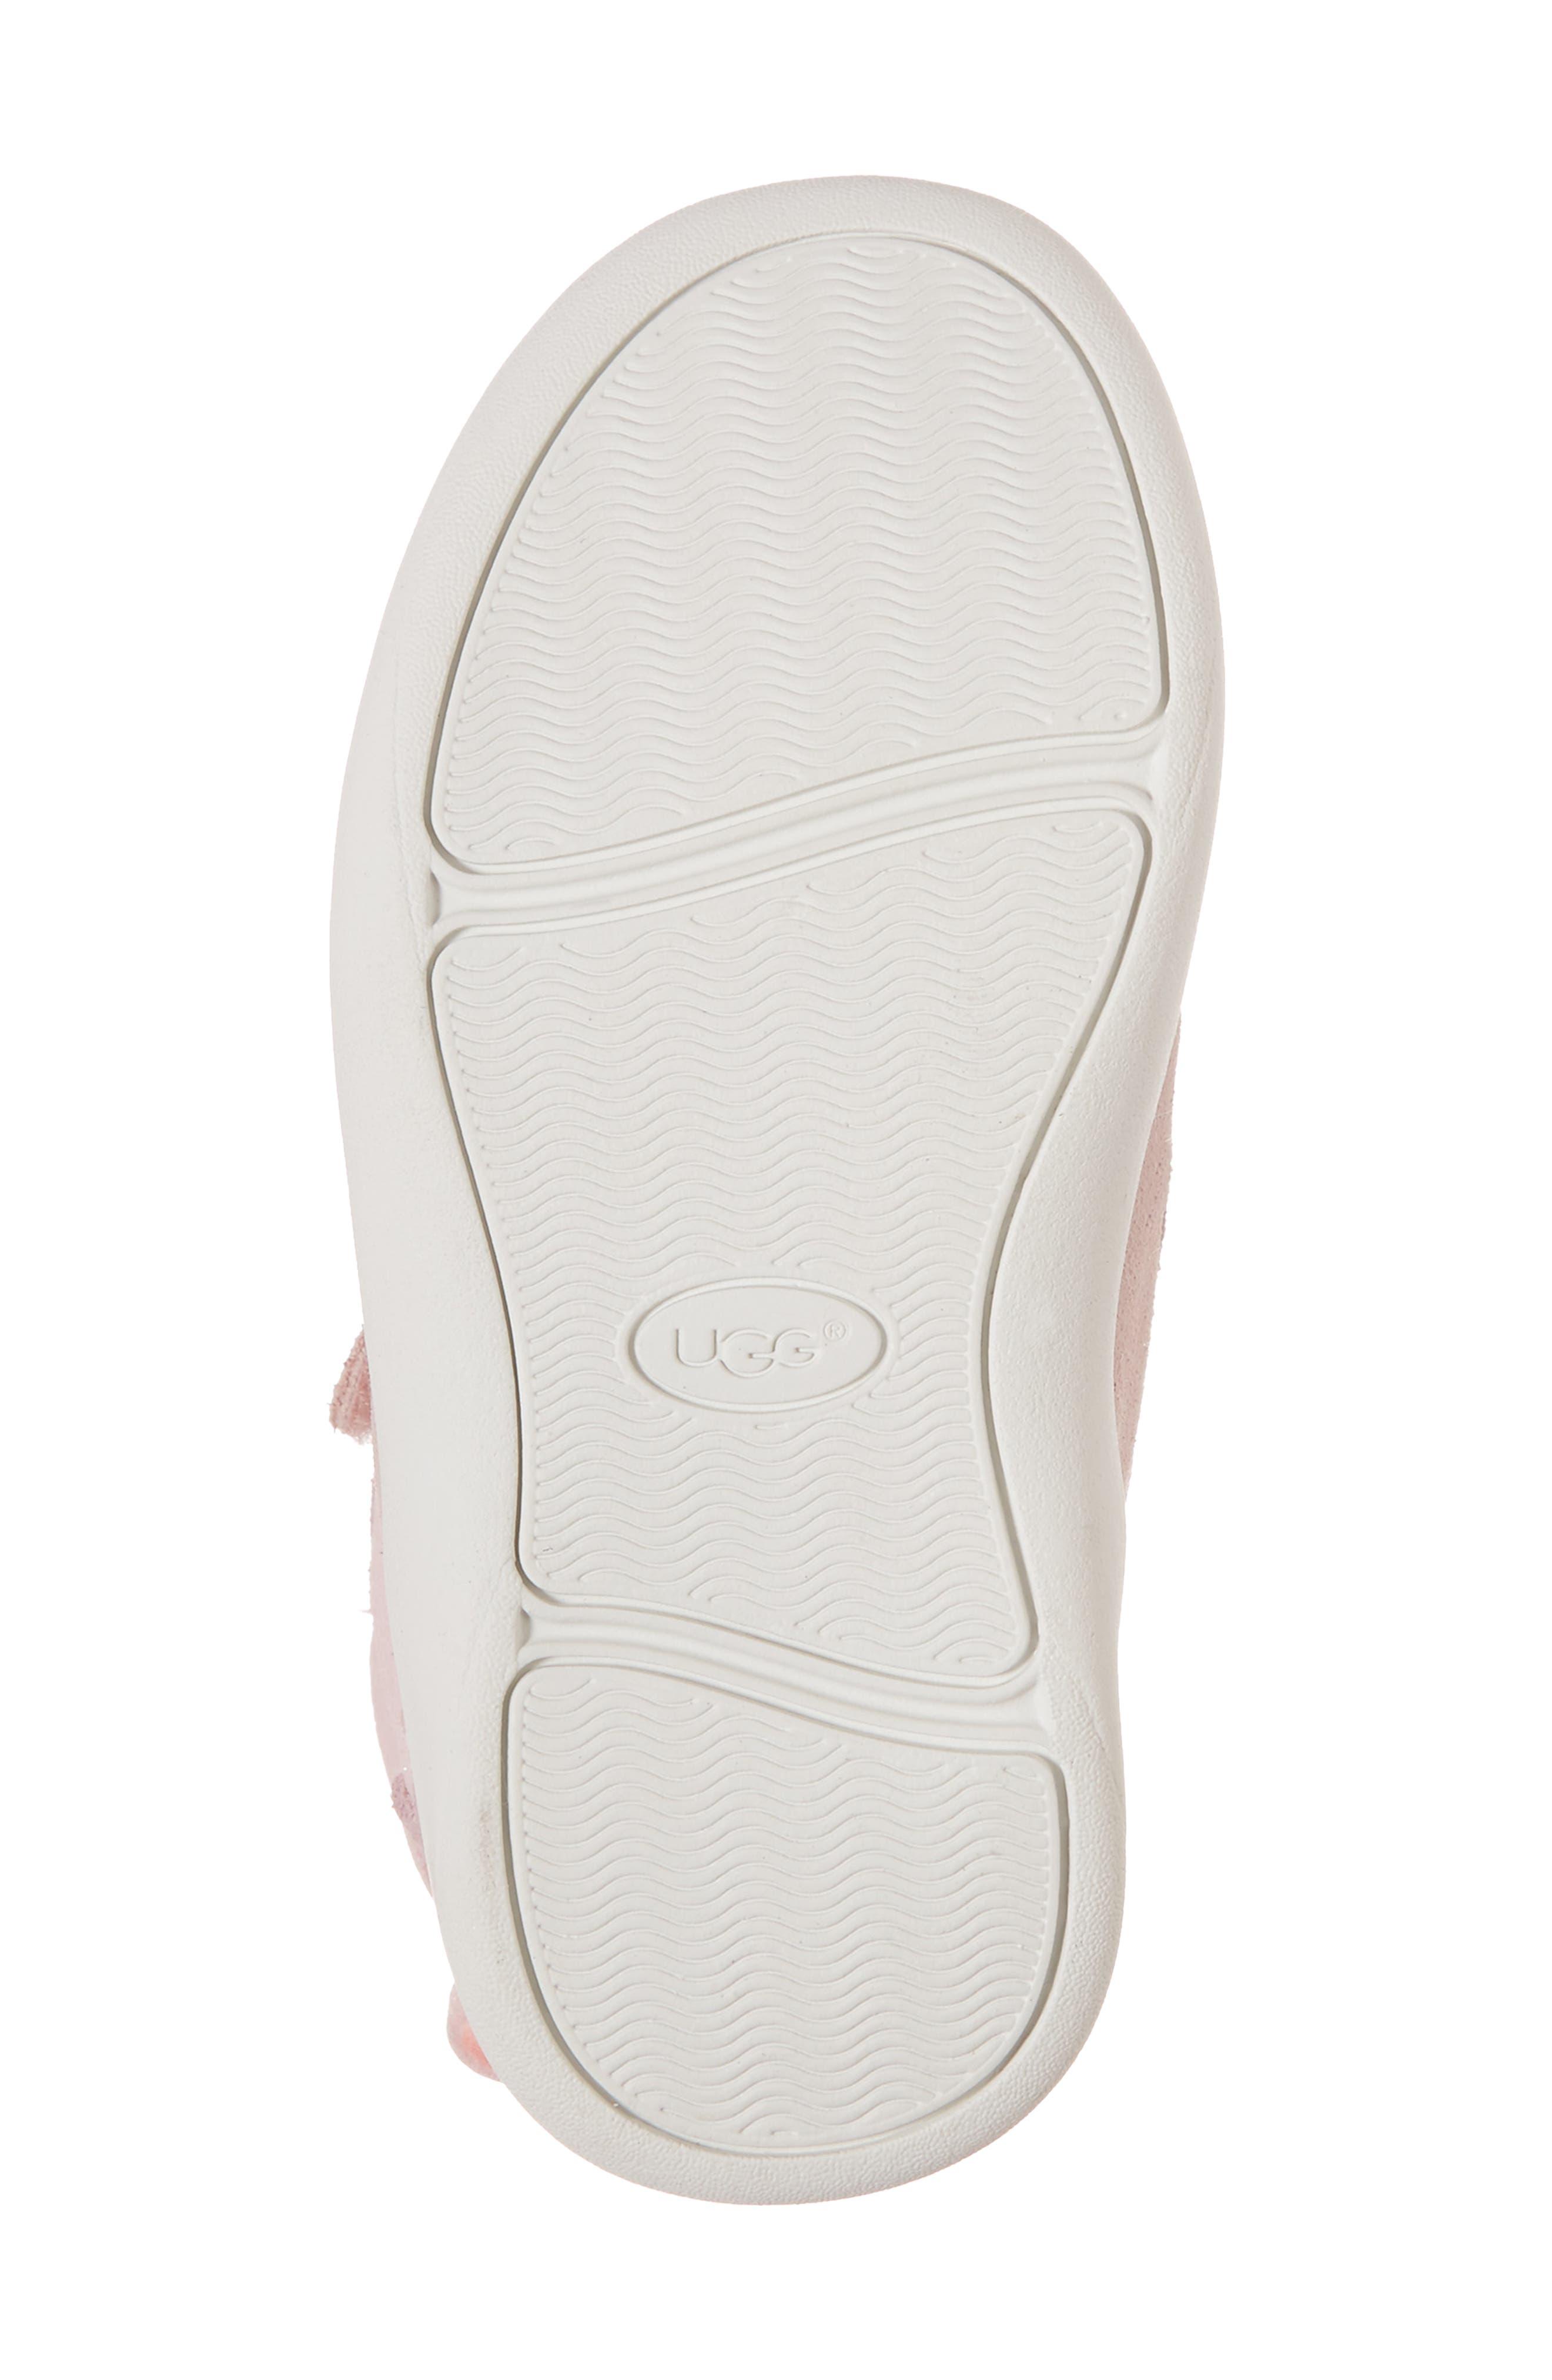 Livv Sunglass Appliqué Sneaker,                             Alternate thumbnail 6, color,                             Seashell Pink